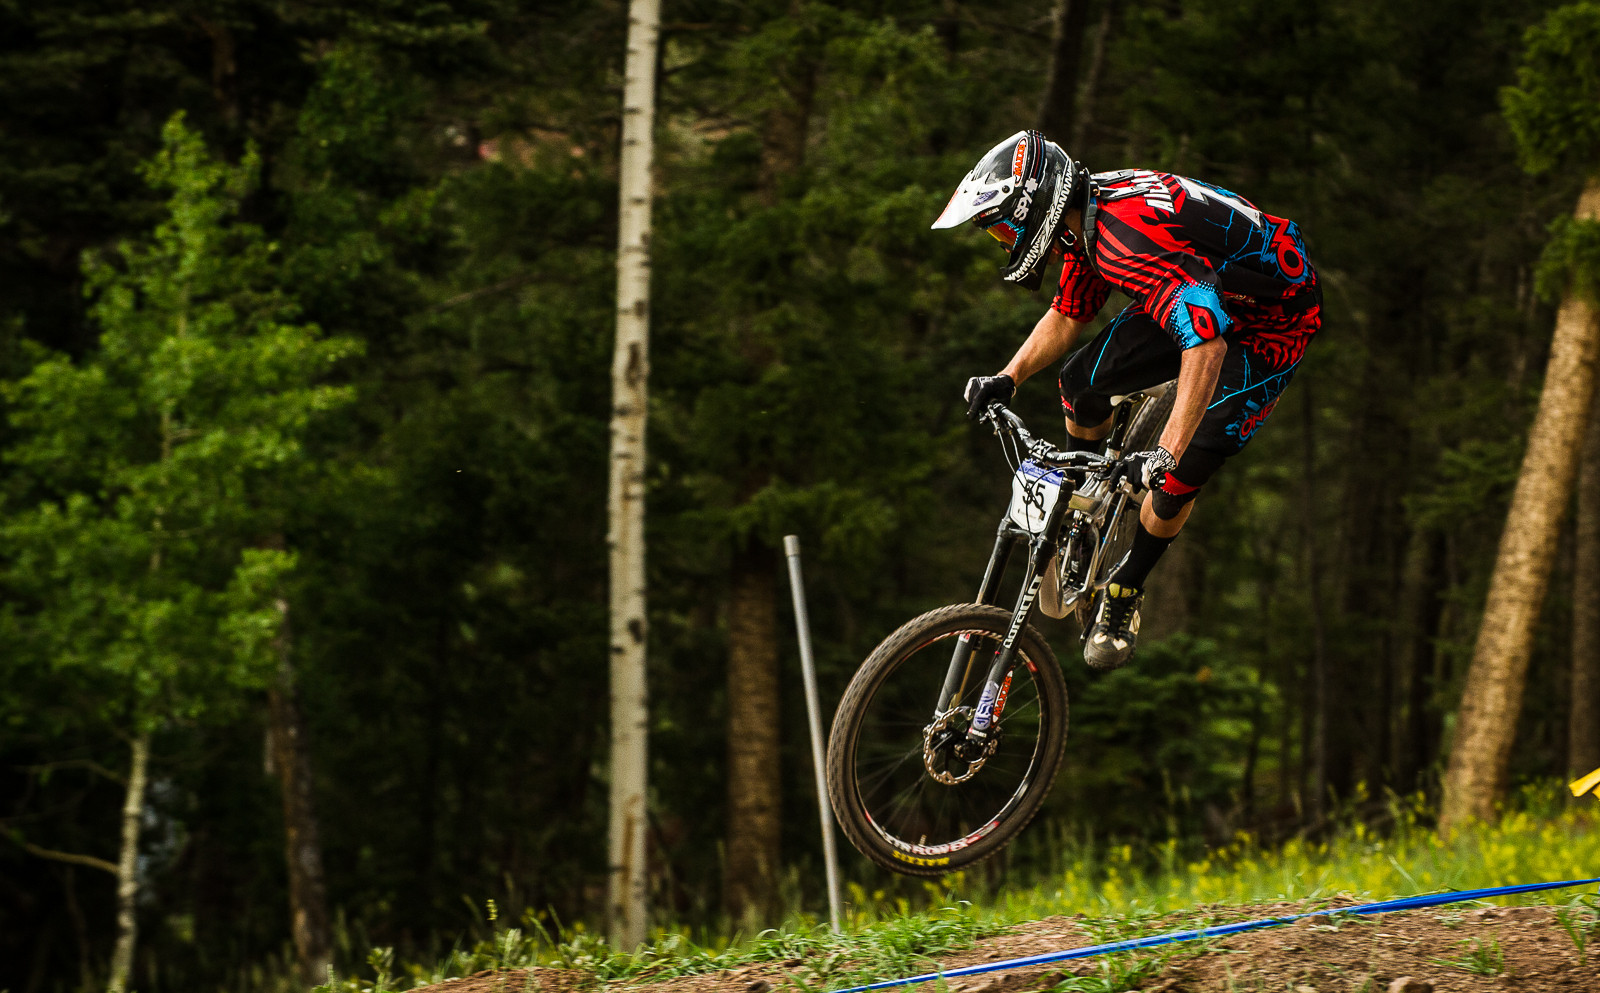 Kevin Aiello, 4th Place, U.S. National Championships Downhill - U.S. National Championship Downhill Finals Photos - Mountain Biking Pictures - Vital MTB